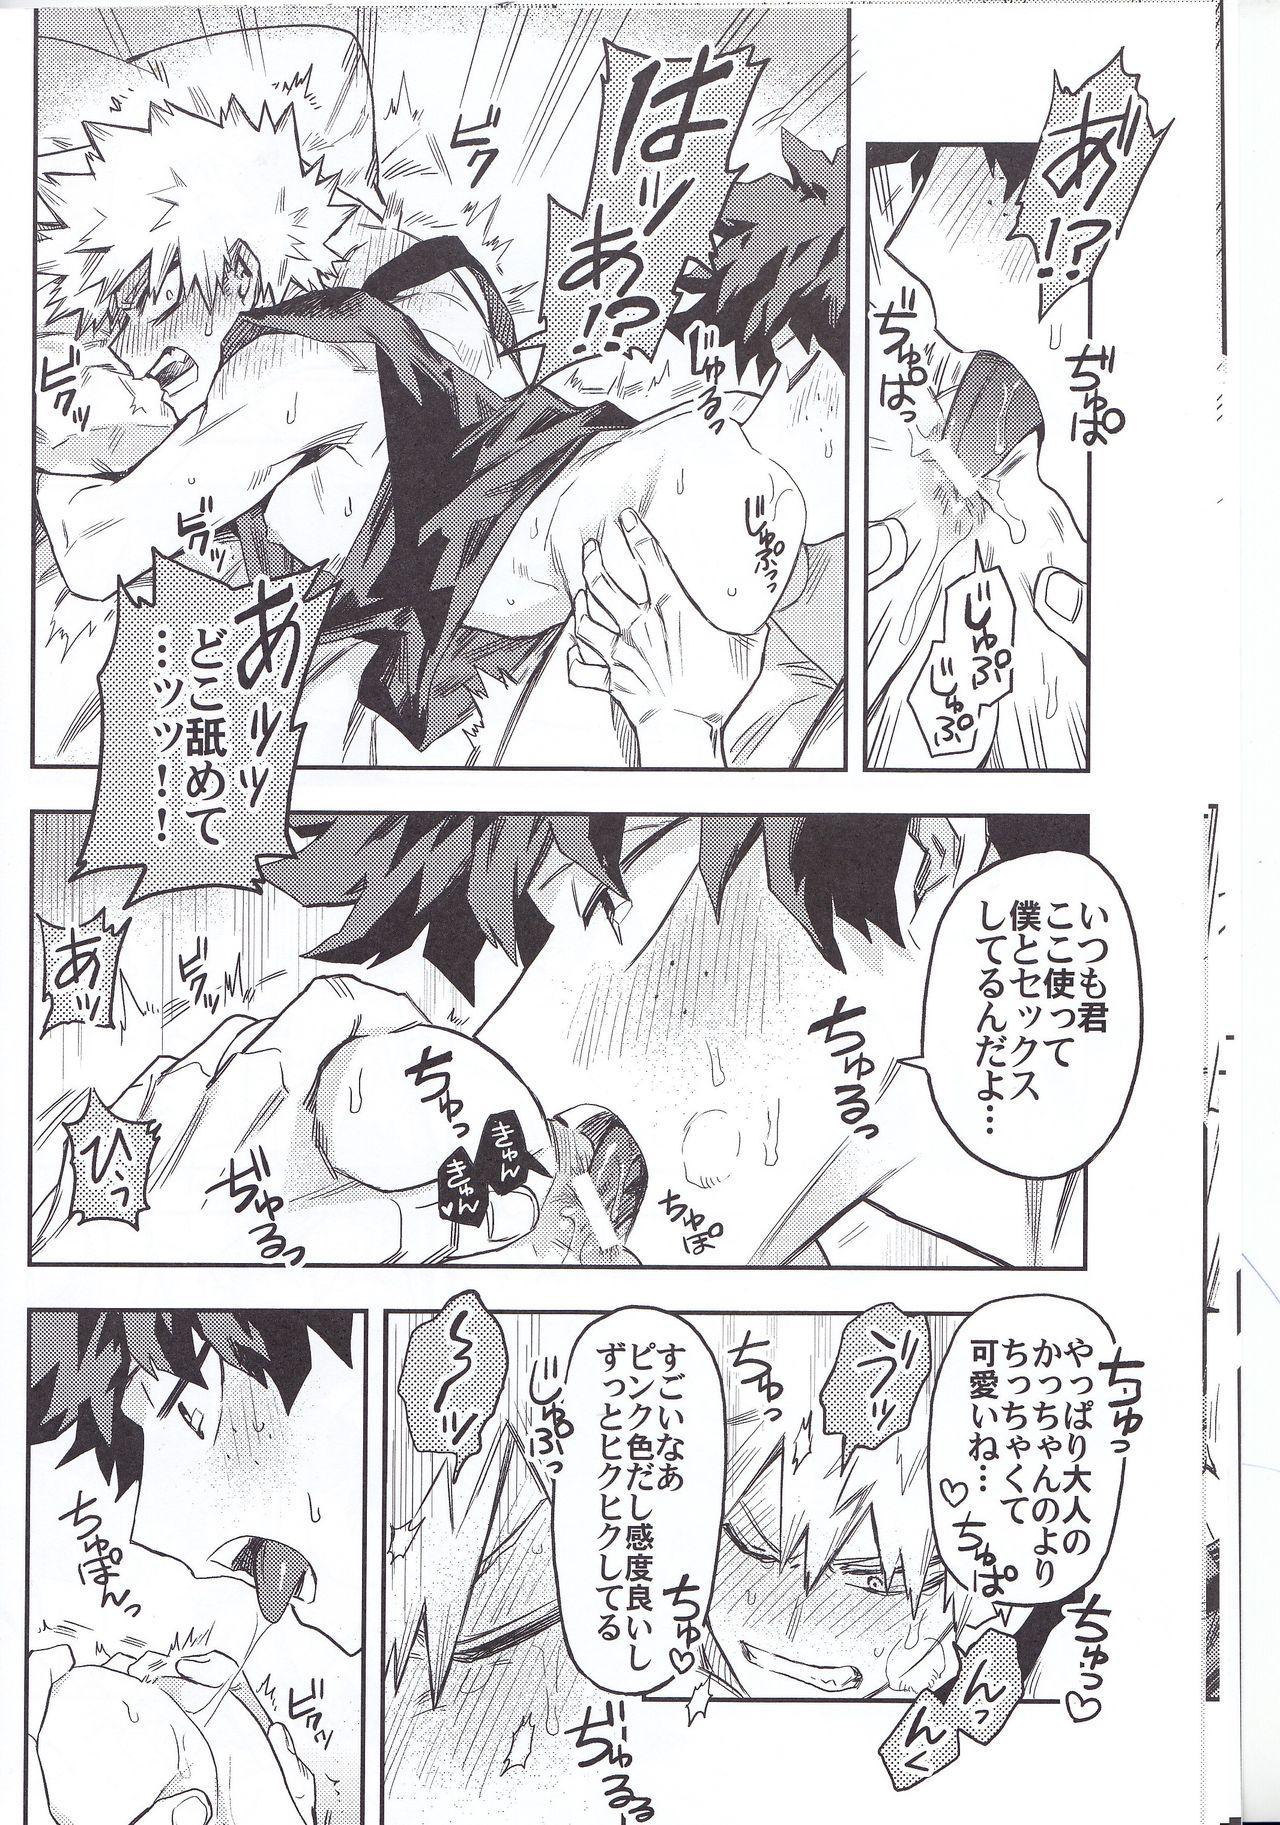 Kuchiguruma ni wa Goyoushin 10